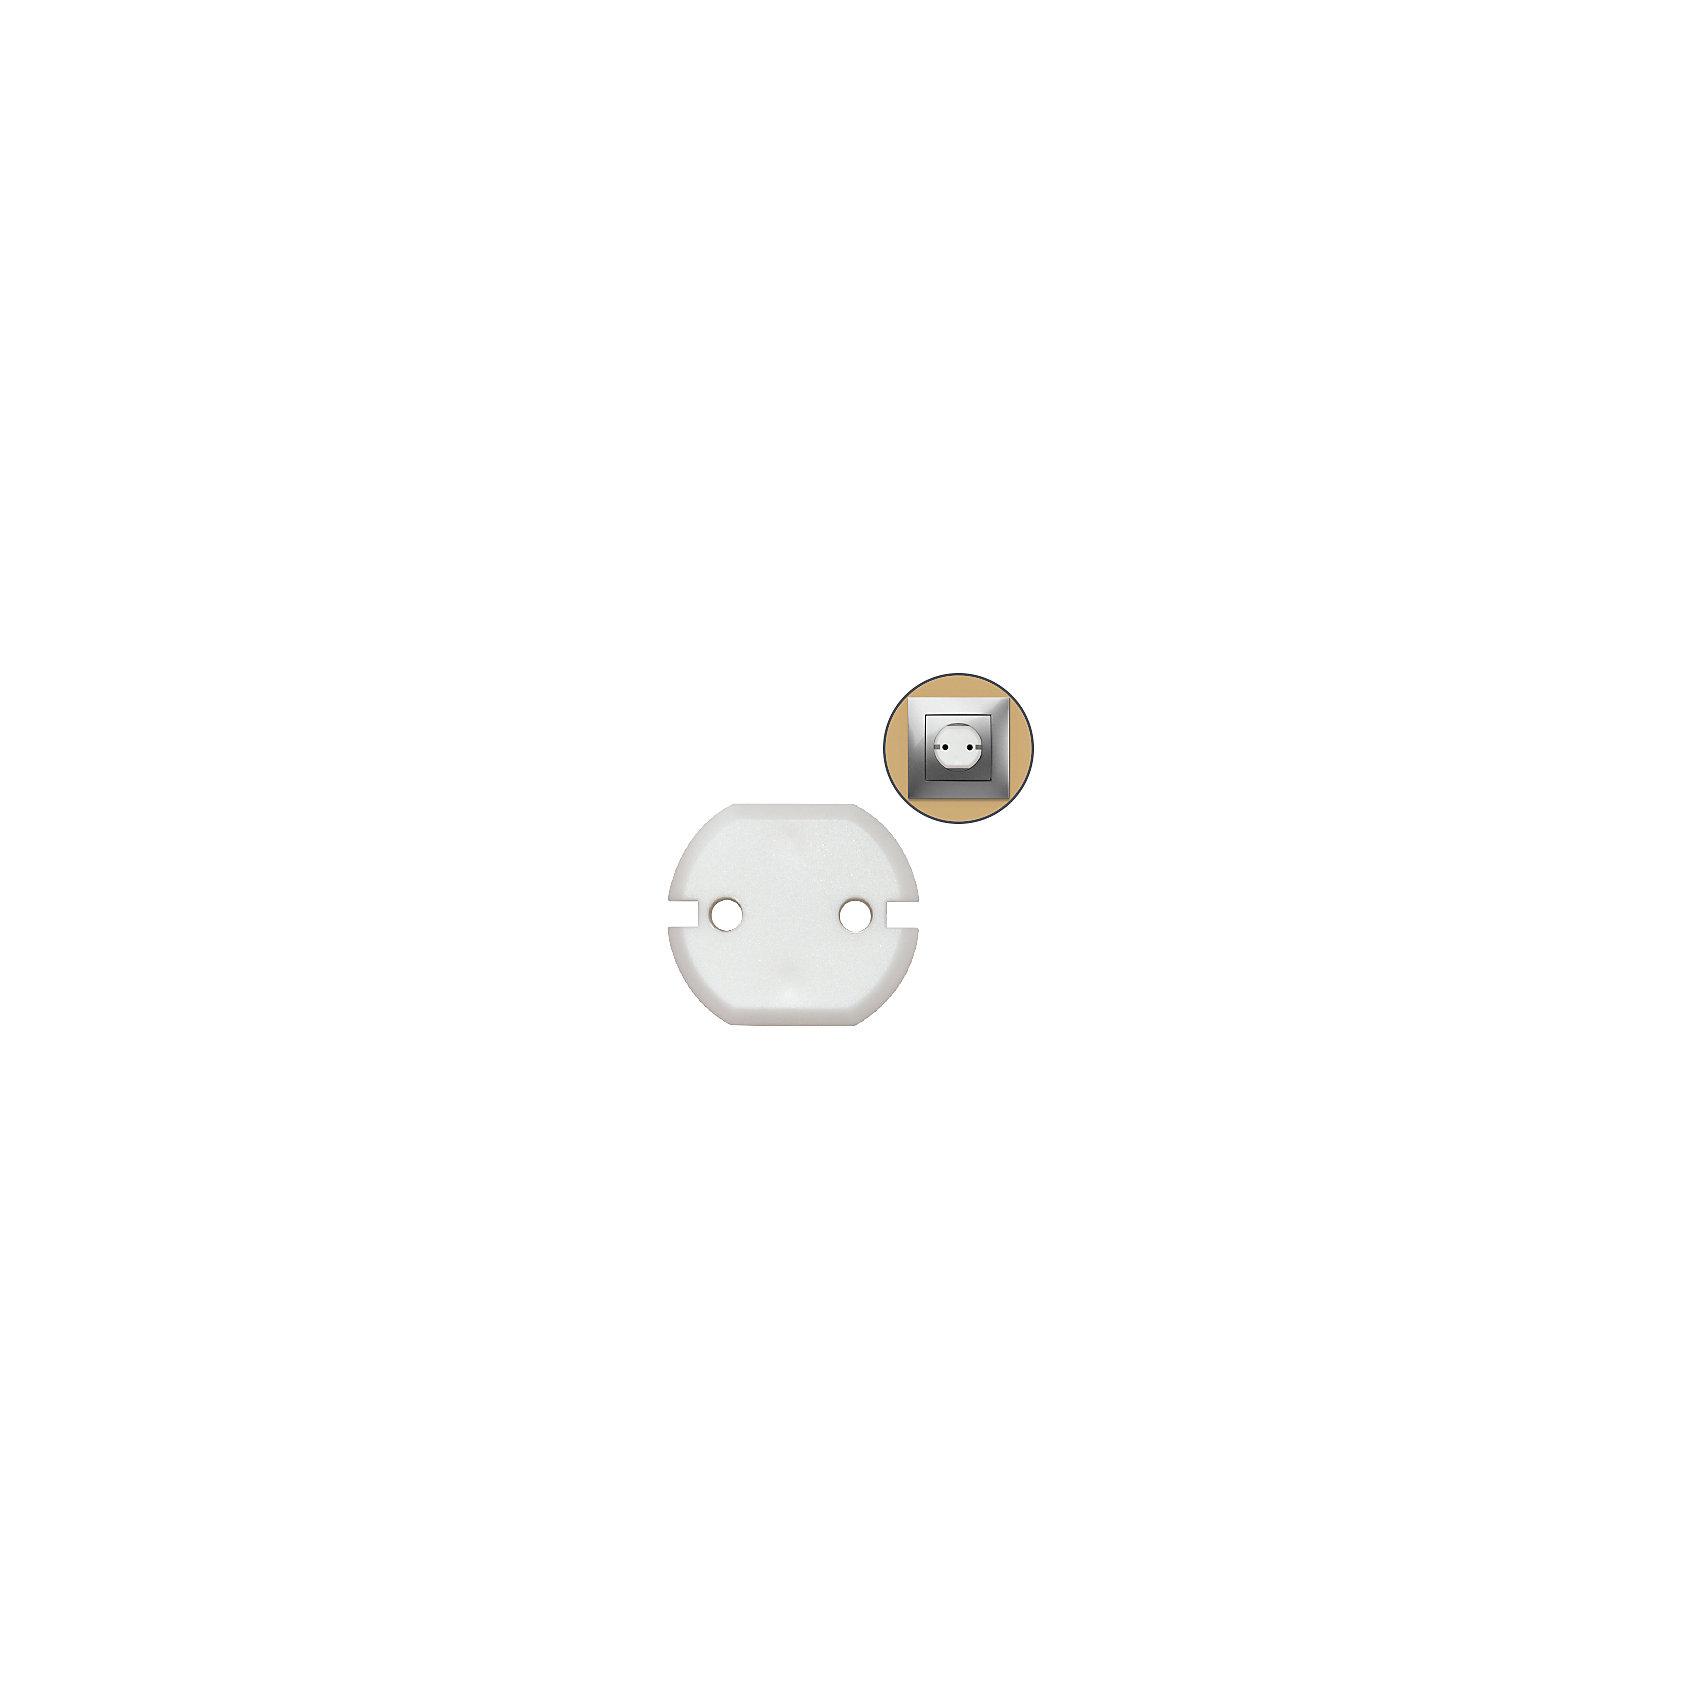 Заглушки для розеток большие 6шт., LUBBY